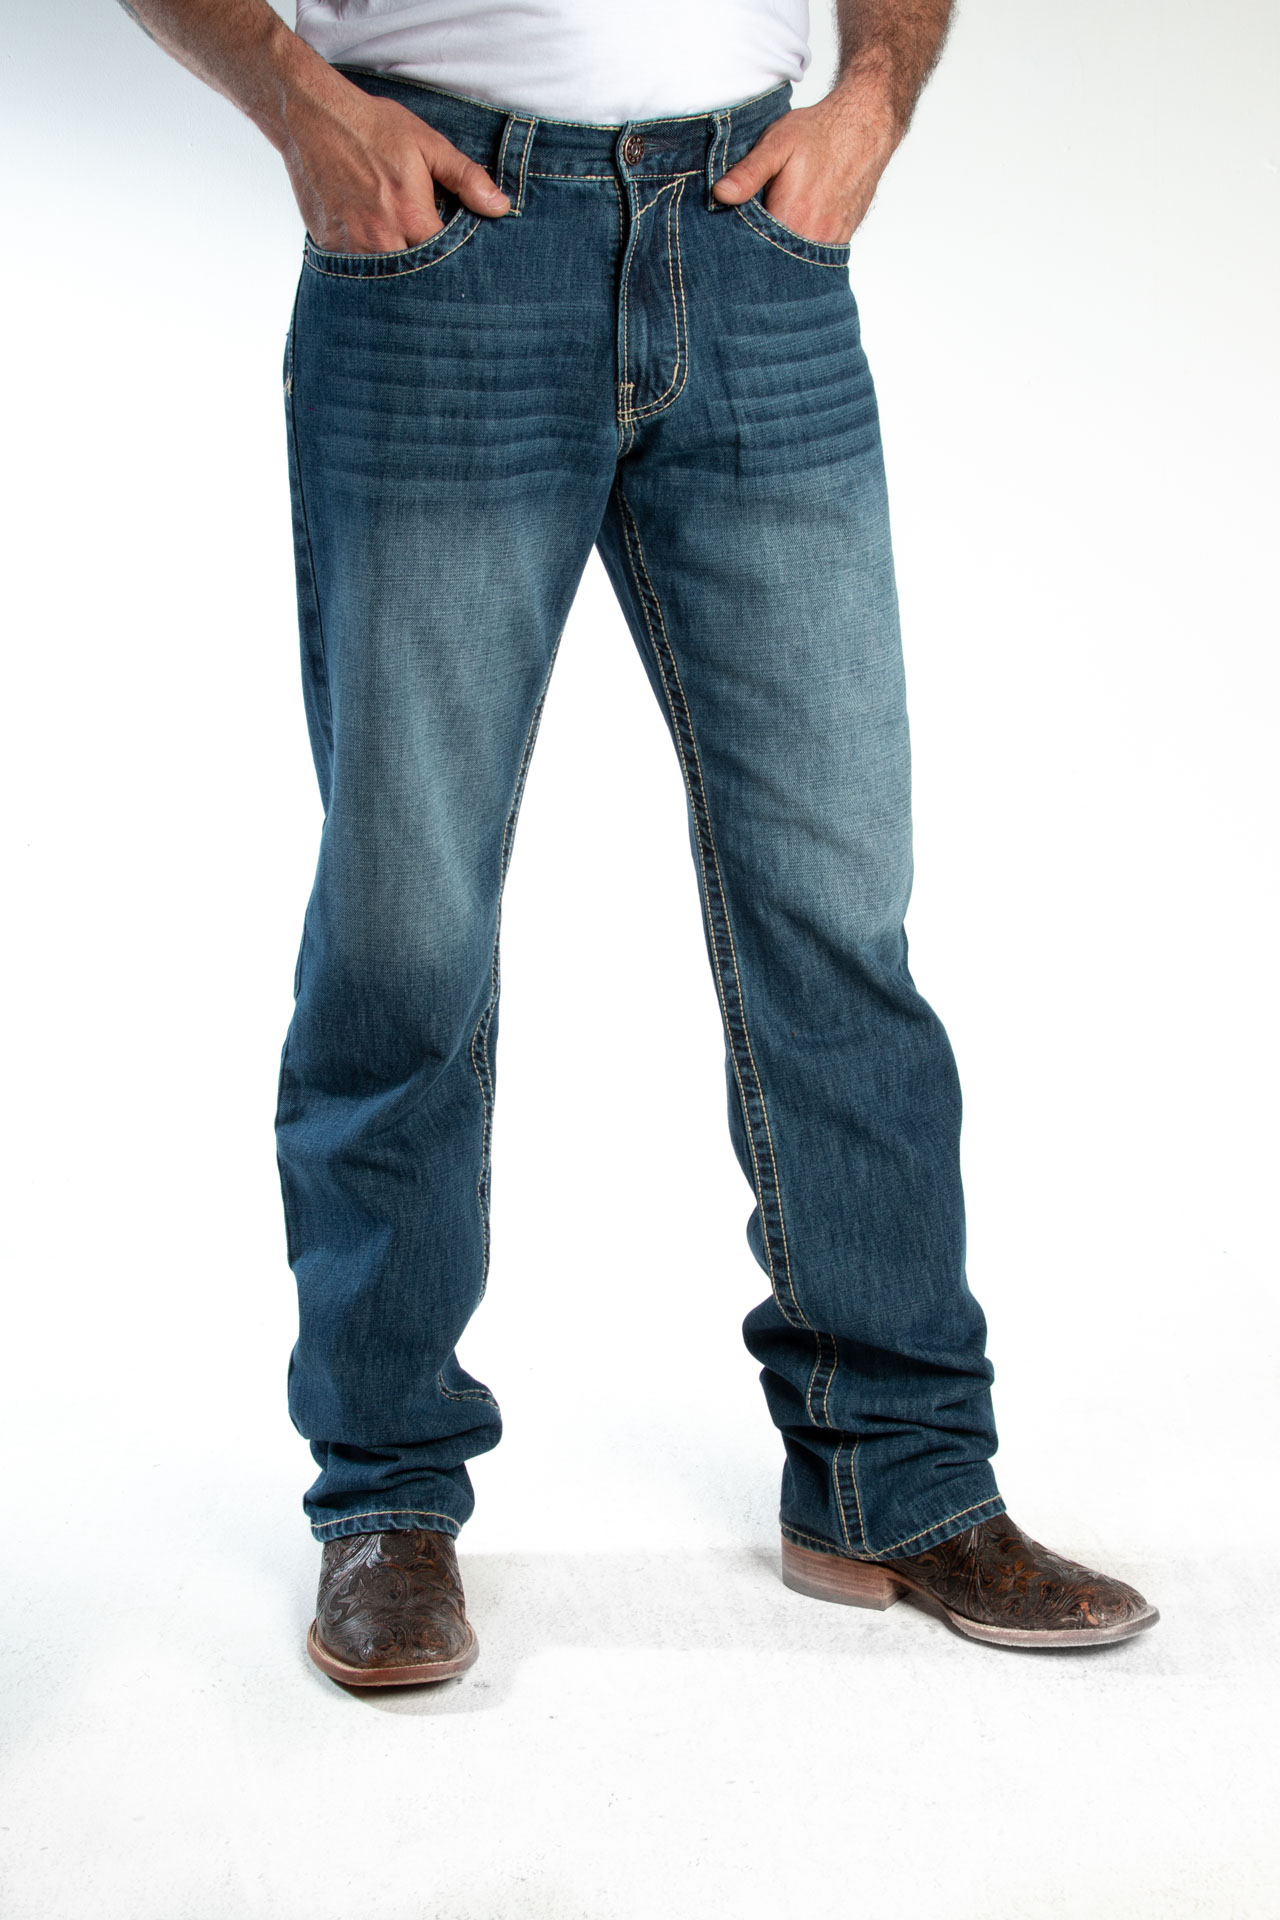 Calça Jeans TXC Masculina X3 SOFT